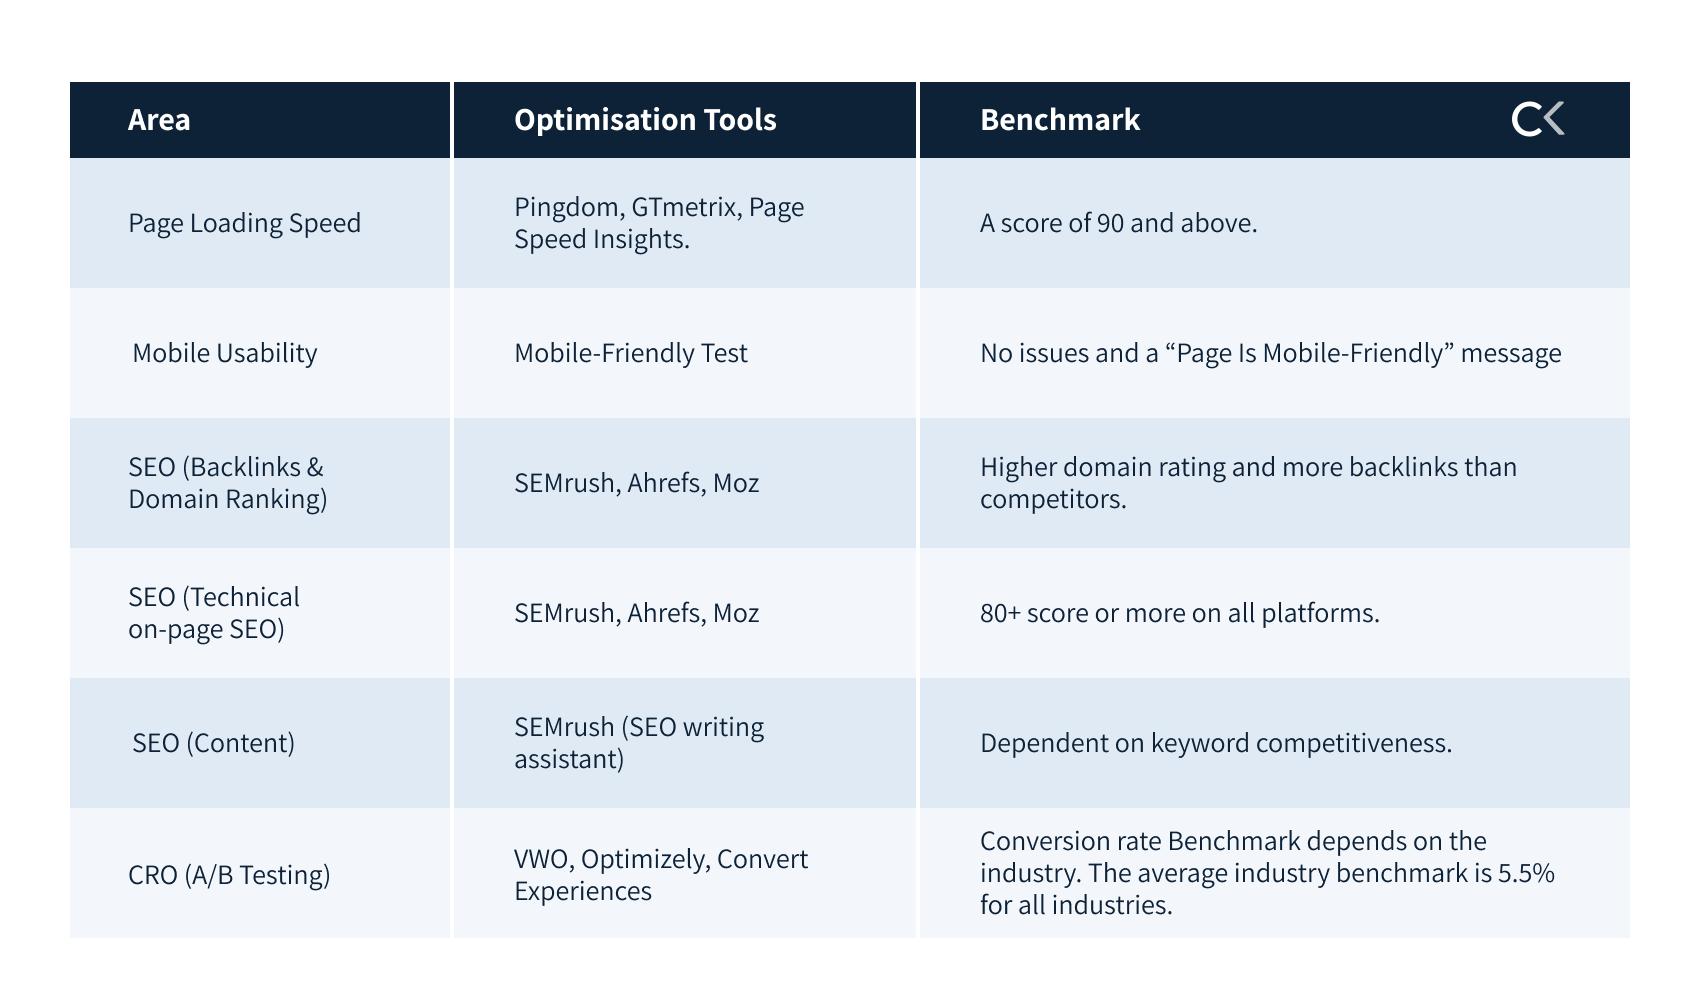 website optimisation tools & benchmarks